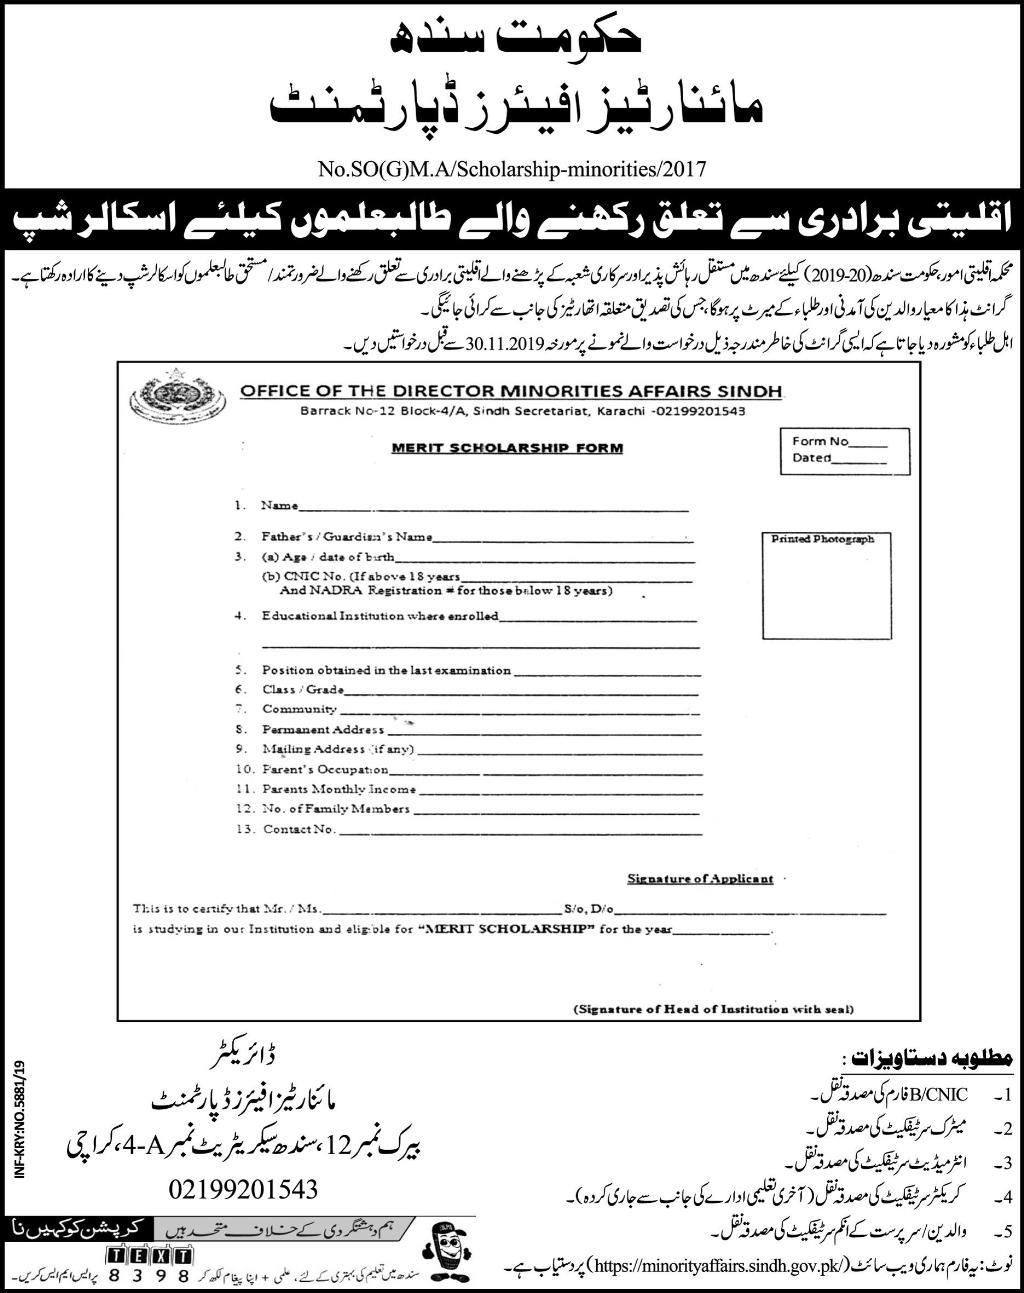 Sindh Directorate Minorities Affairs department Merit Scholarship 2019-20 Form